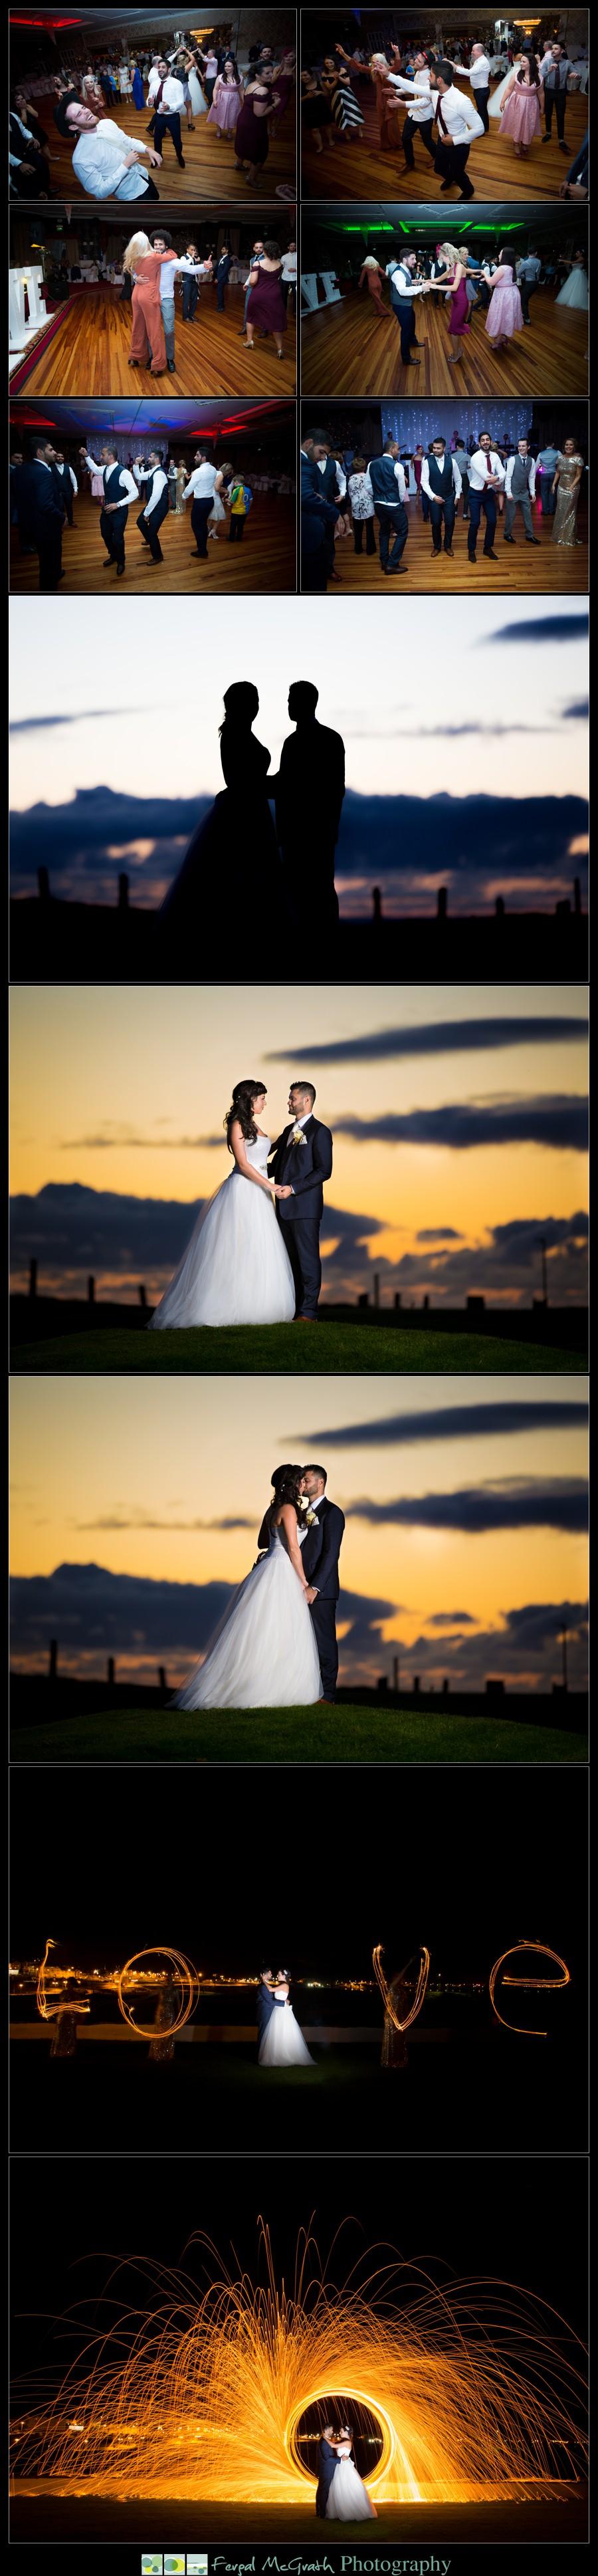 Great Northern Hotel Bundoran Wedding Niamh and Khalil beautiful bride and groom photos at sunset in ireland